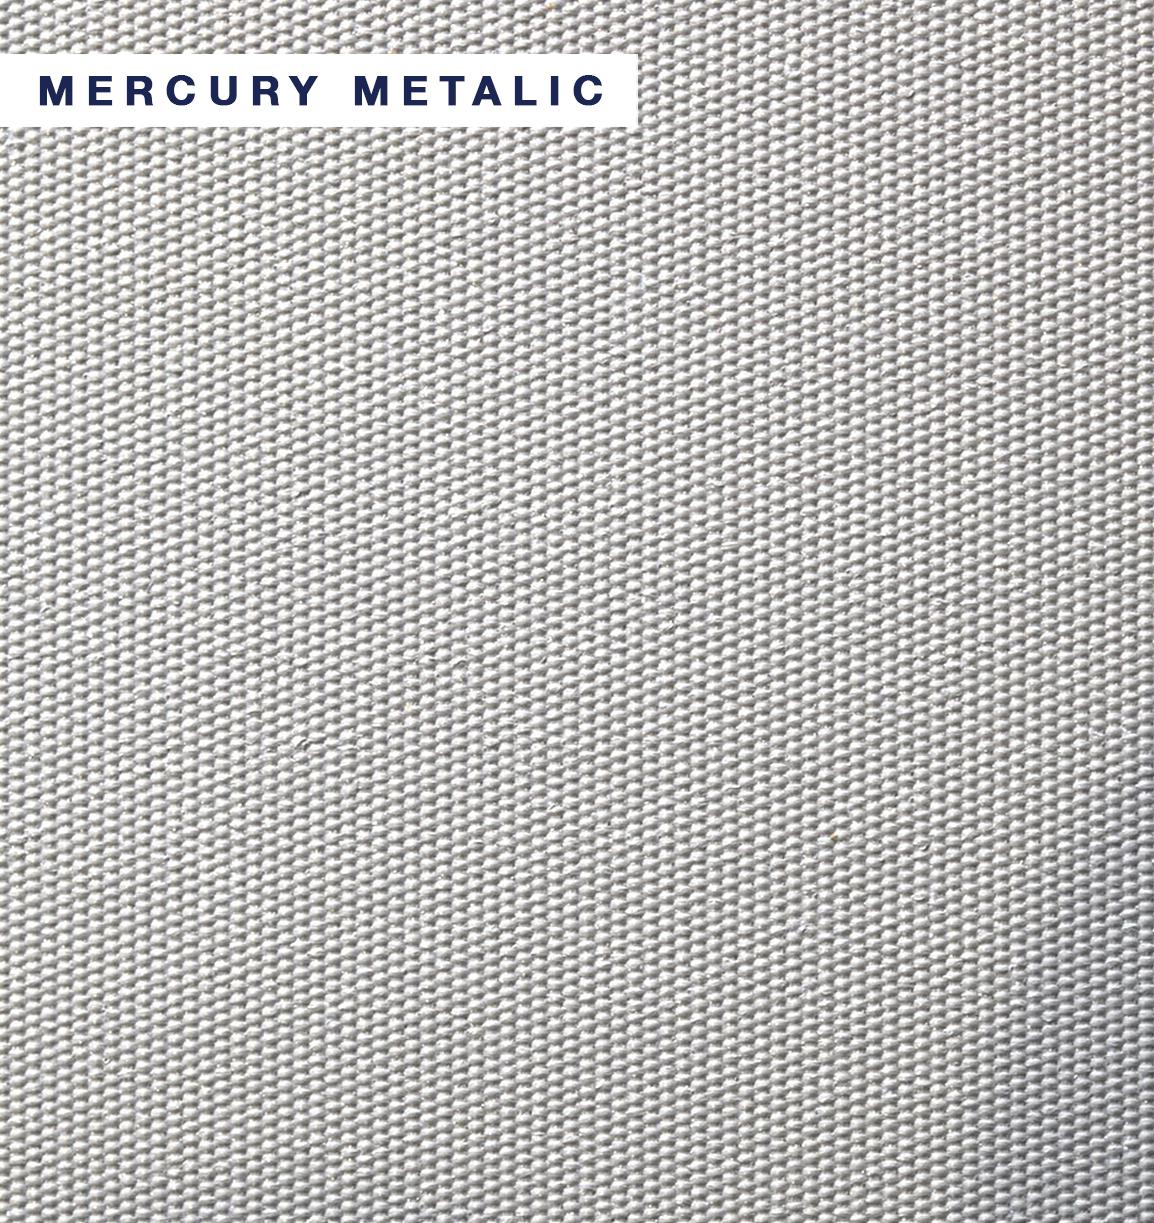 VIBE - Mercury Metallic.jpg